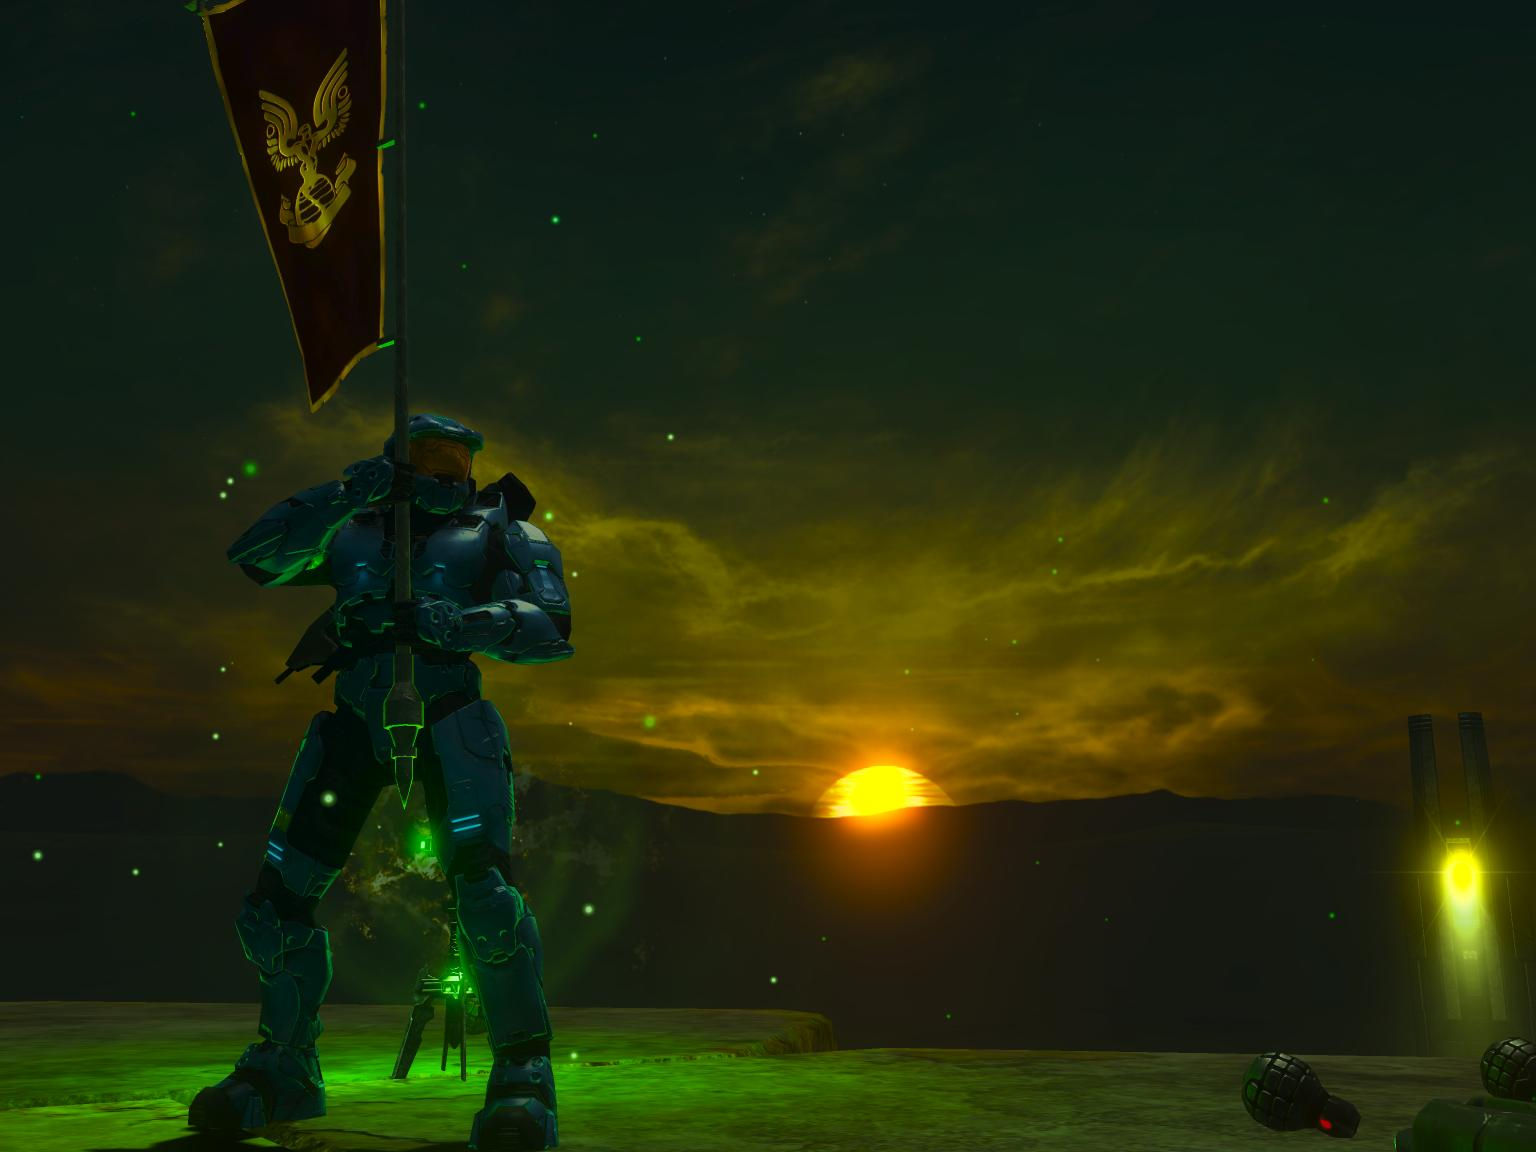 Halo Diehards - Home to Halo and Destiny Diehards everywhere